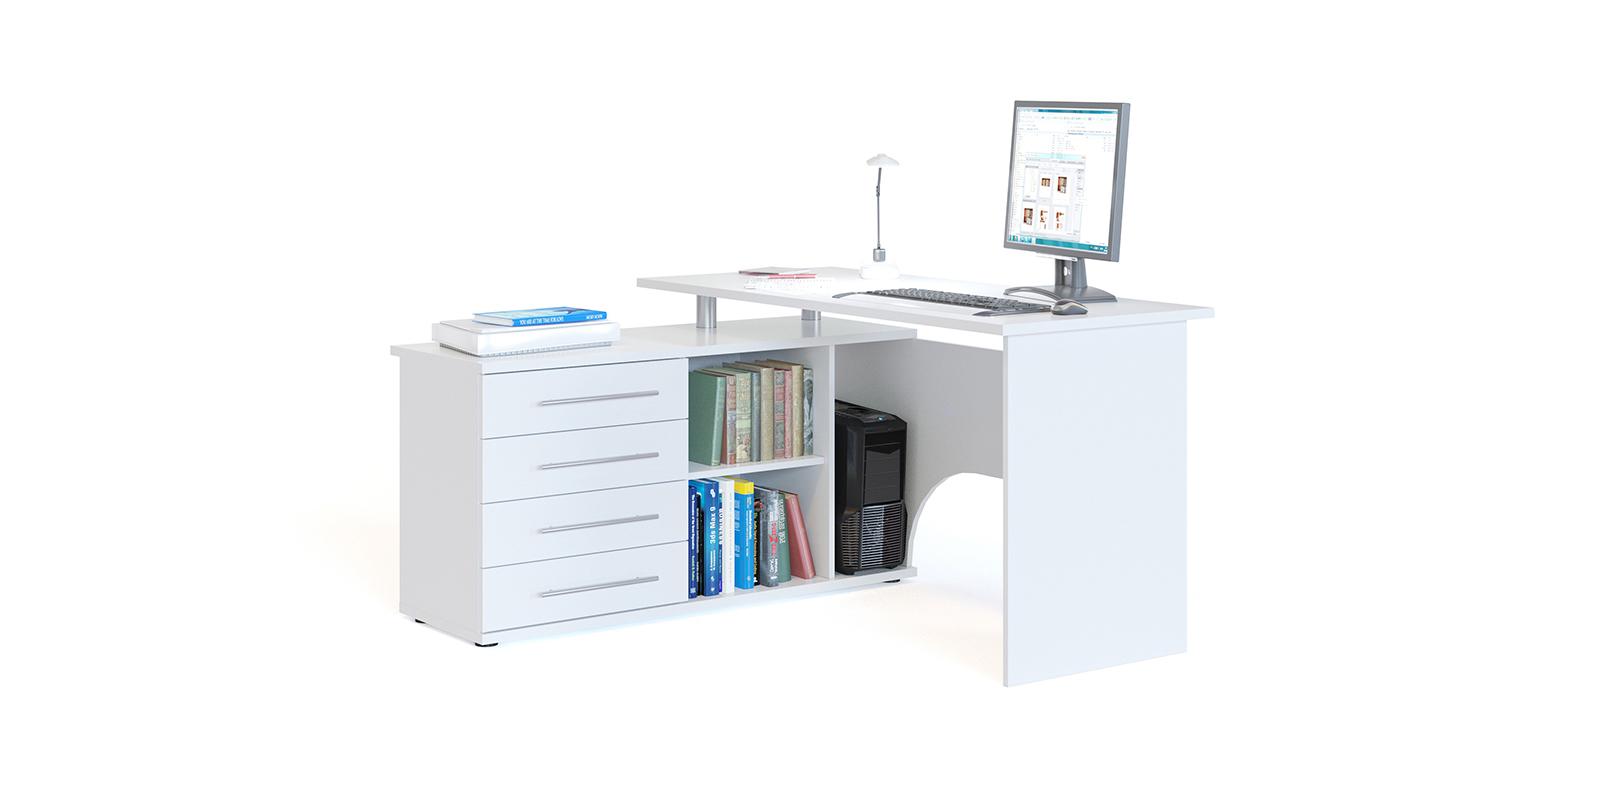 Стол компьютерный Сноу левый угол (белый)